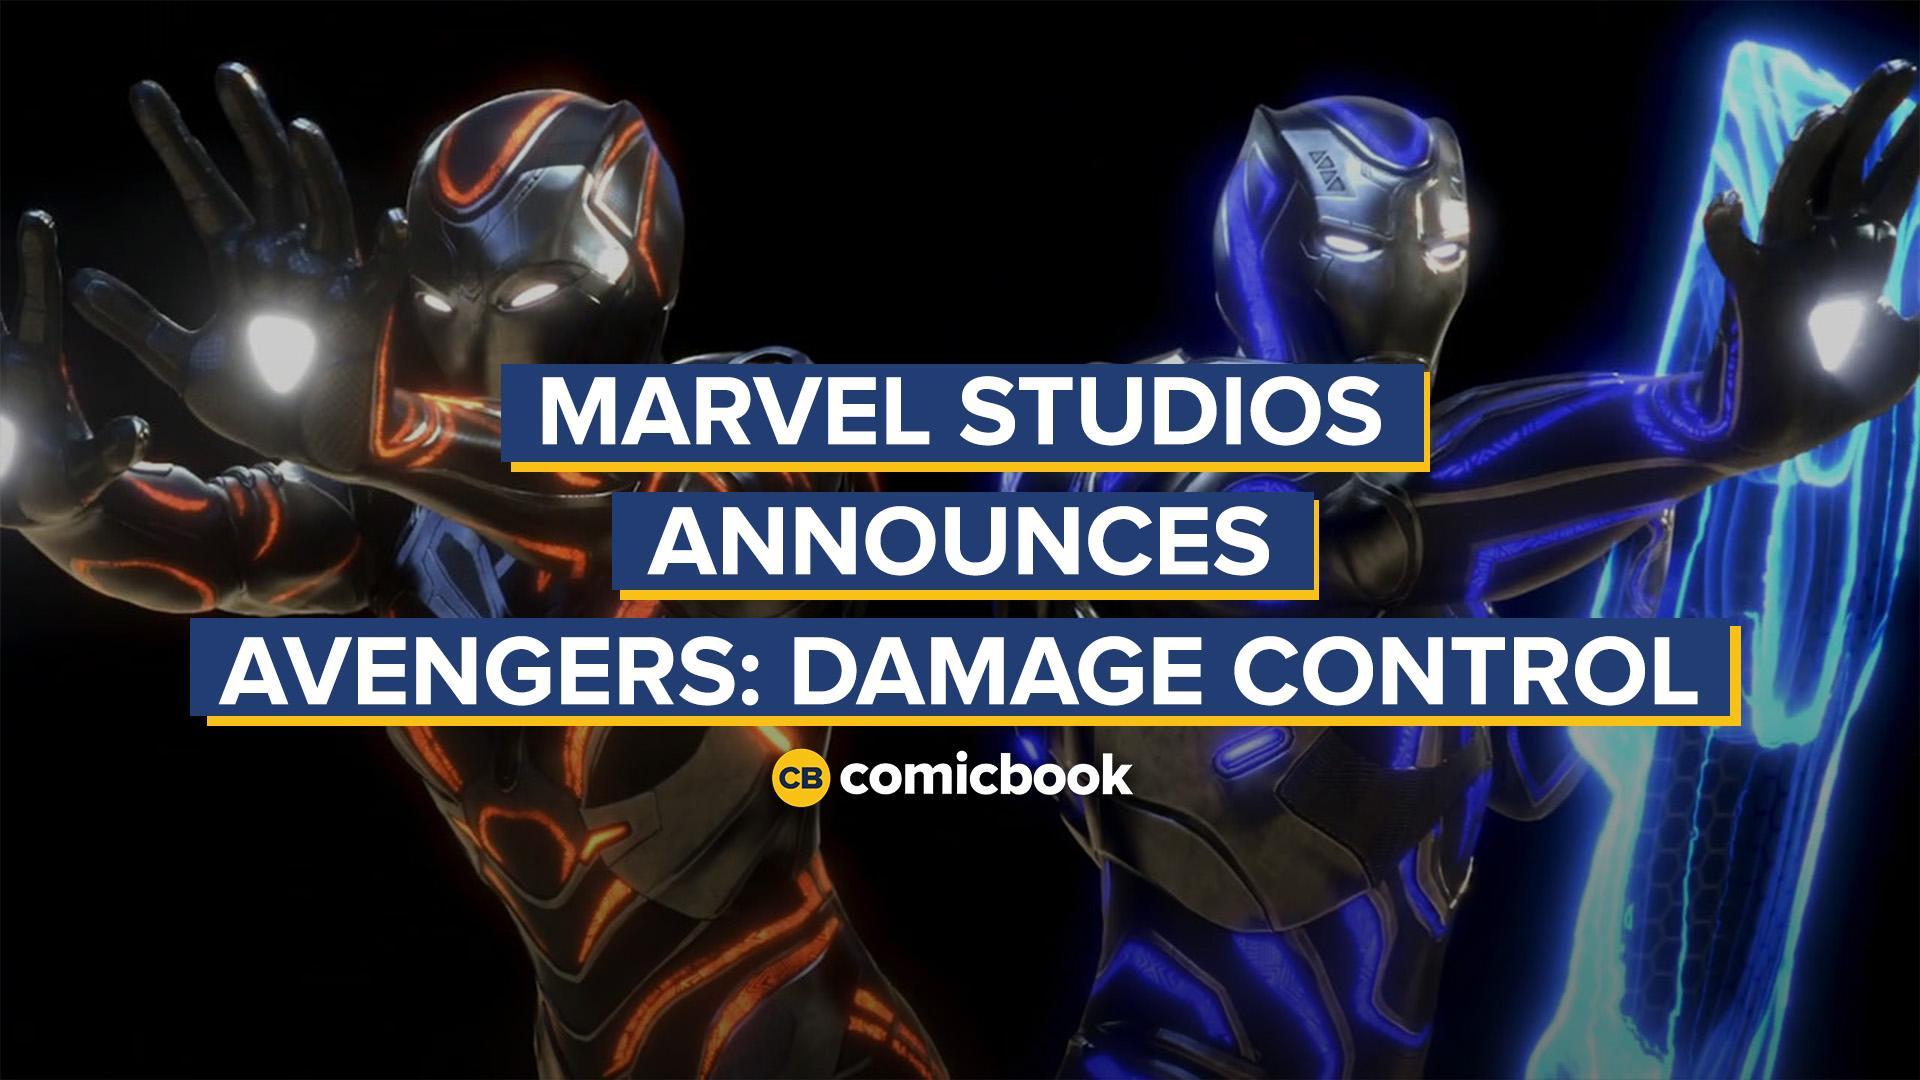 Marvel Studios Announces Avengers: Damage Control VR Game screen capture